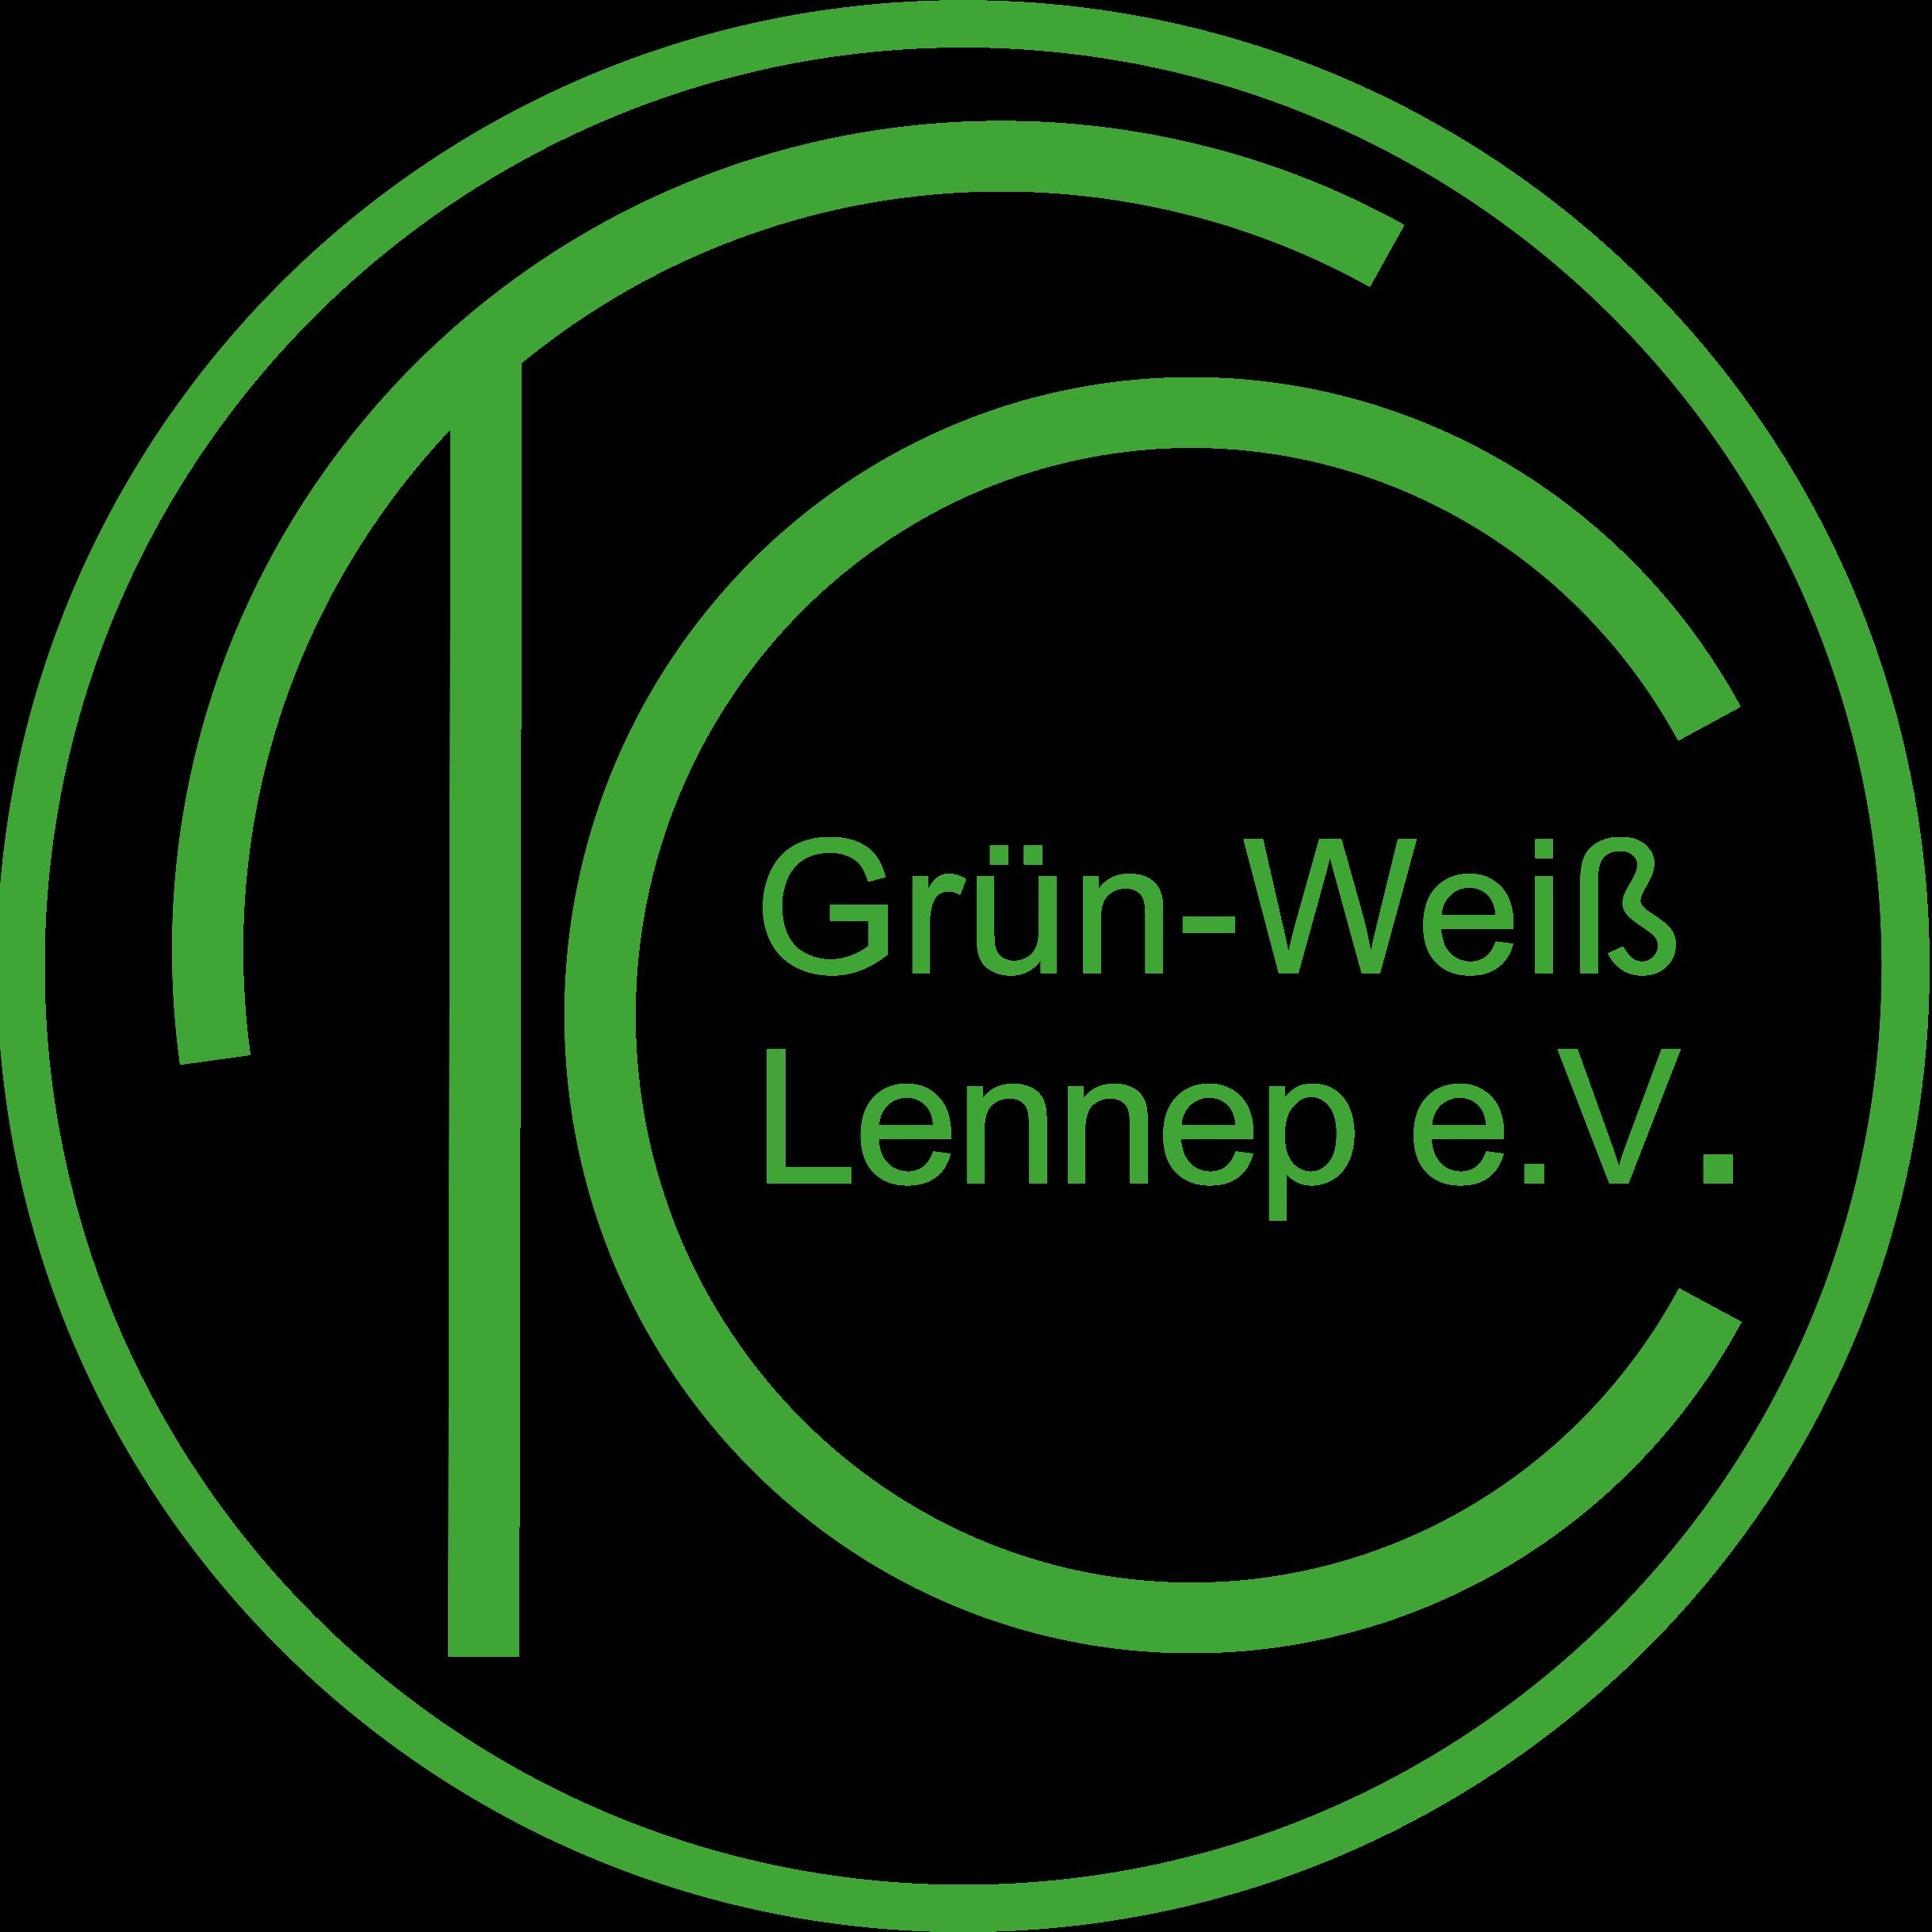 TC Grün-Weiß Lennep